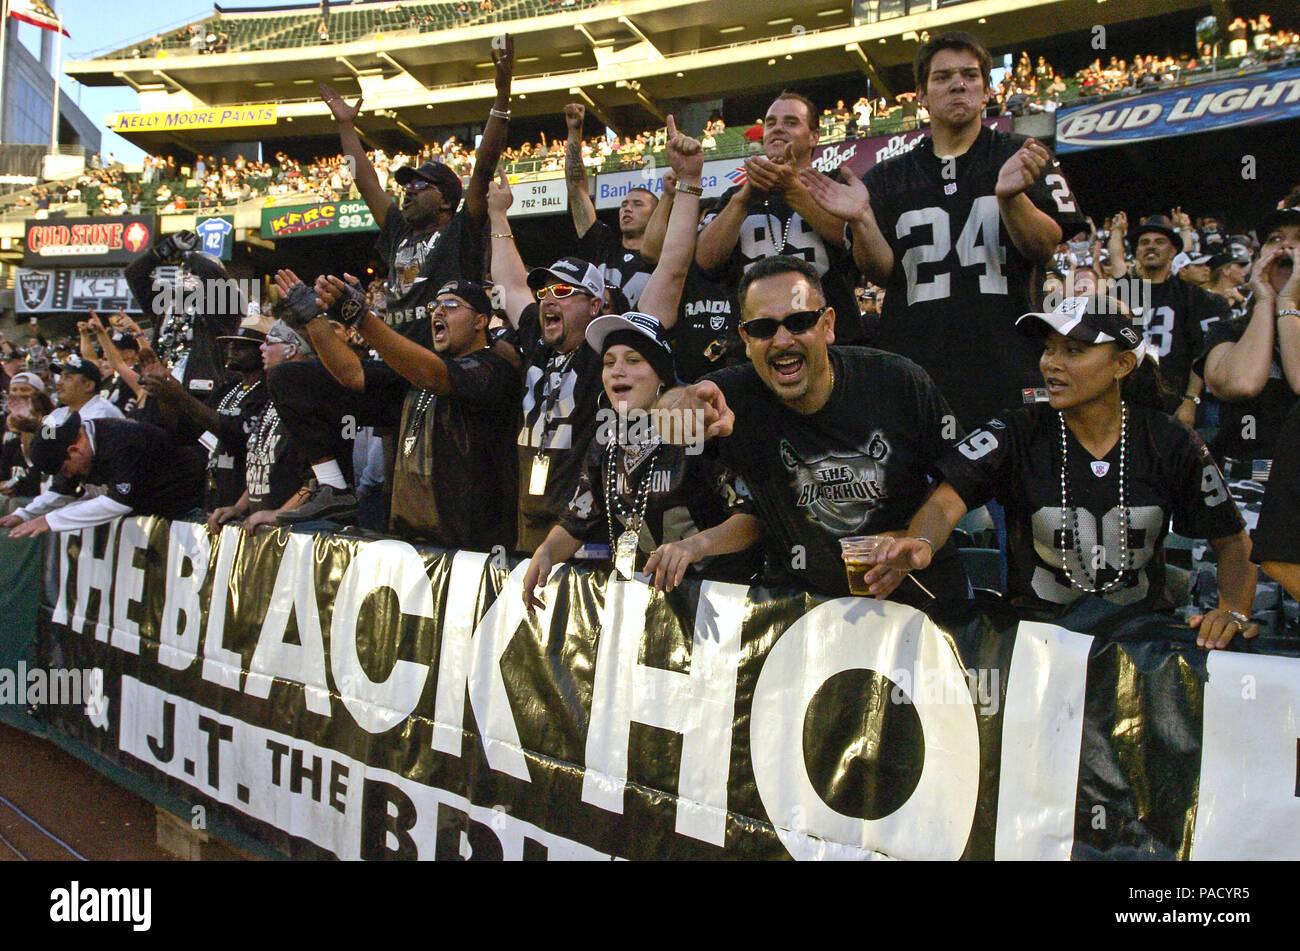 Black Hole Fans : Oakland california usa nd sep the black hole